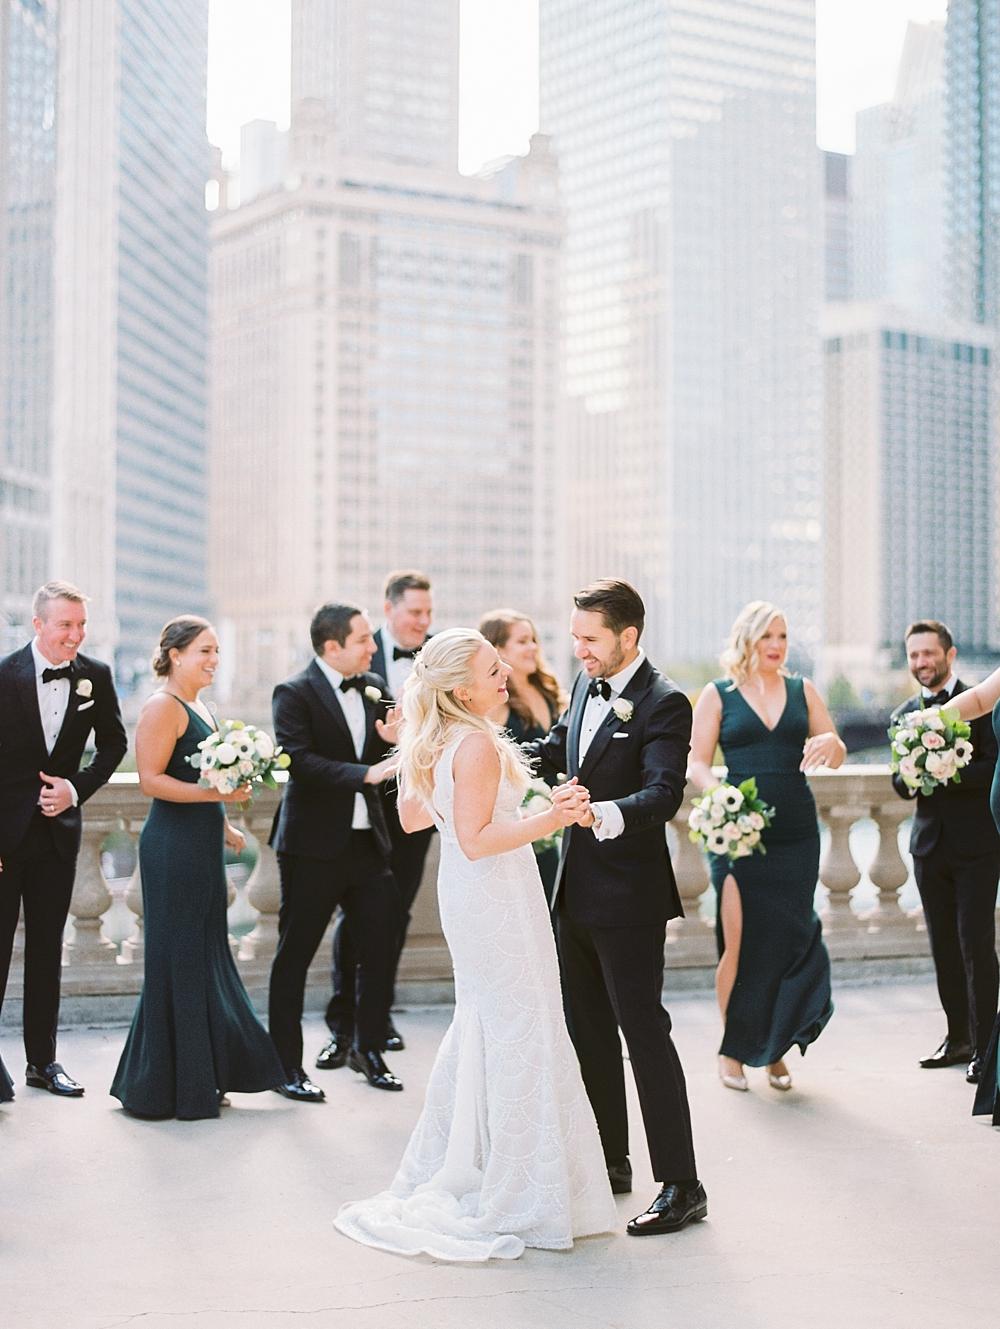 kristin-la-voie-photography-chicago-Wedding-Photographer-kimpton-gray-hotel-11